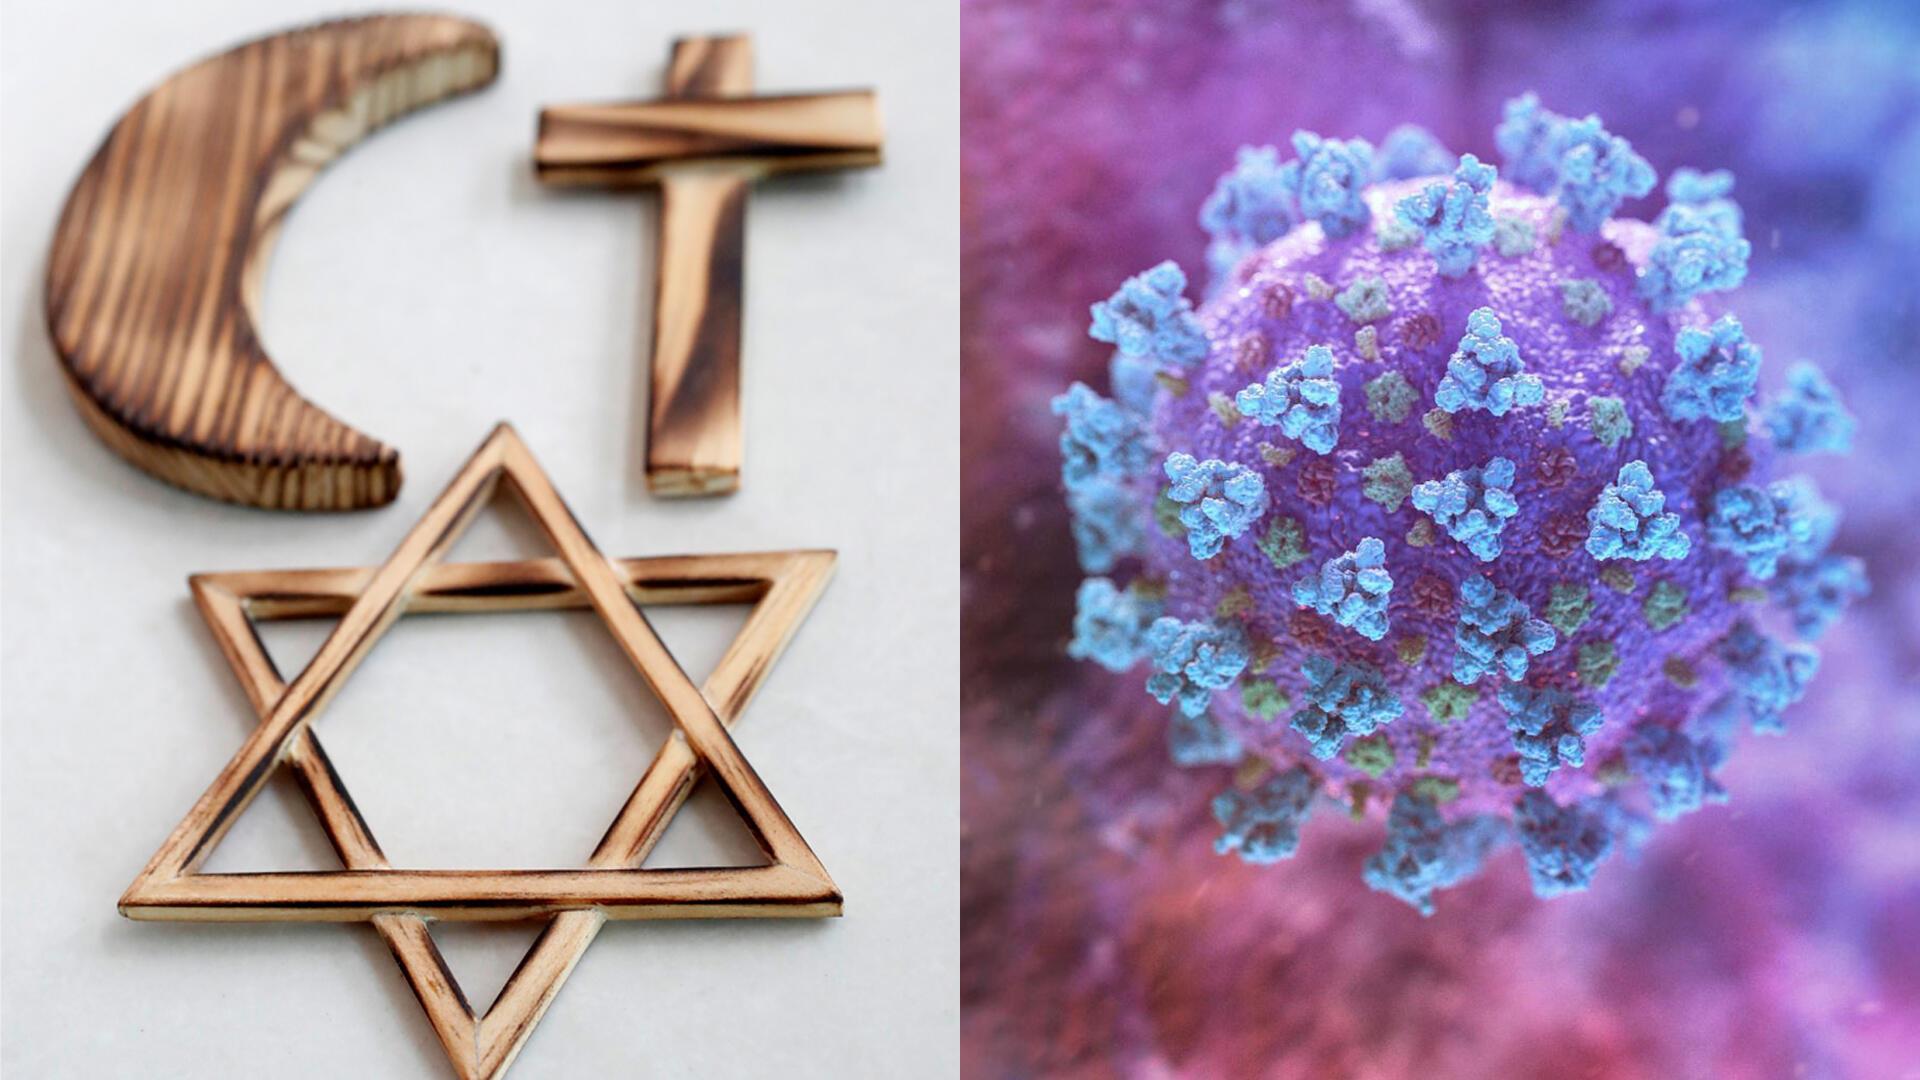 montage symboles religieux_covid 19_religions monde